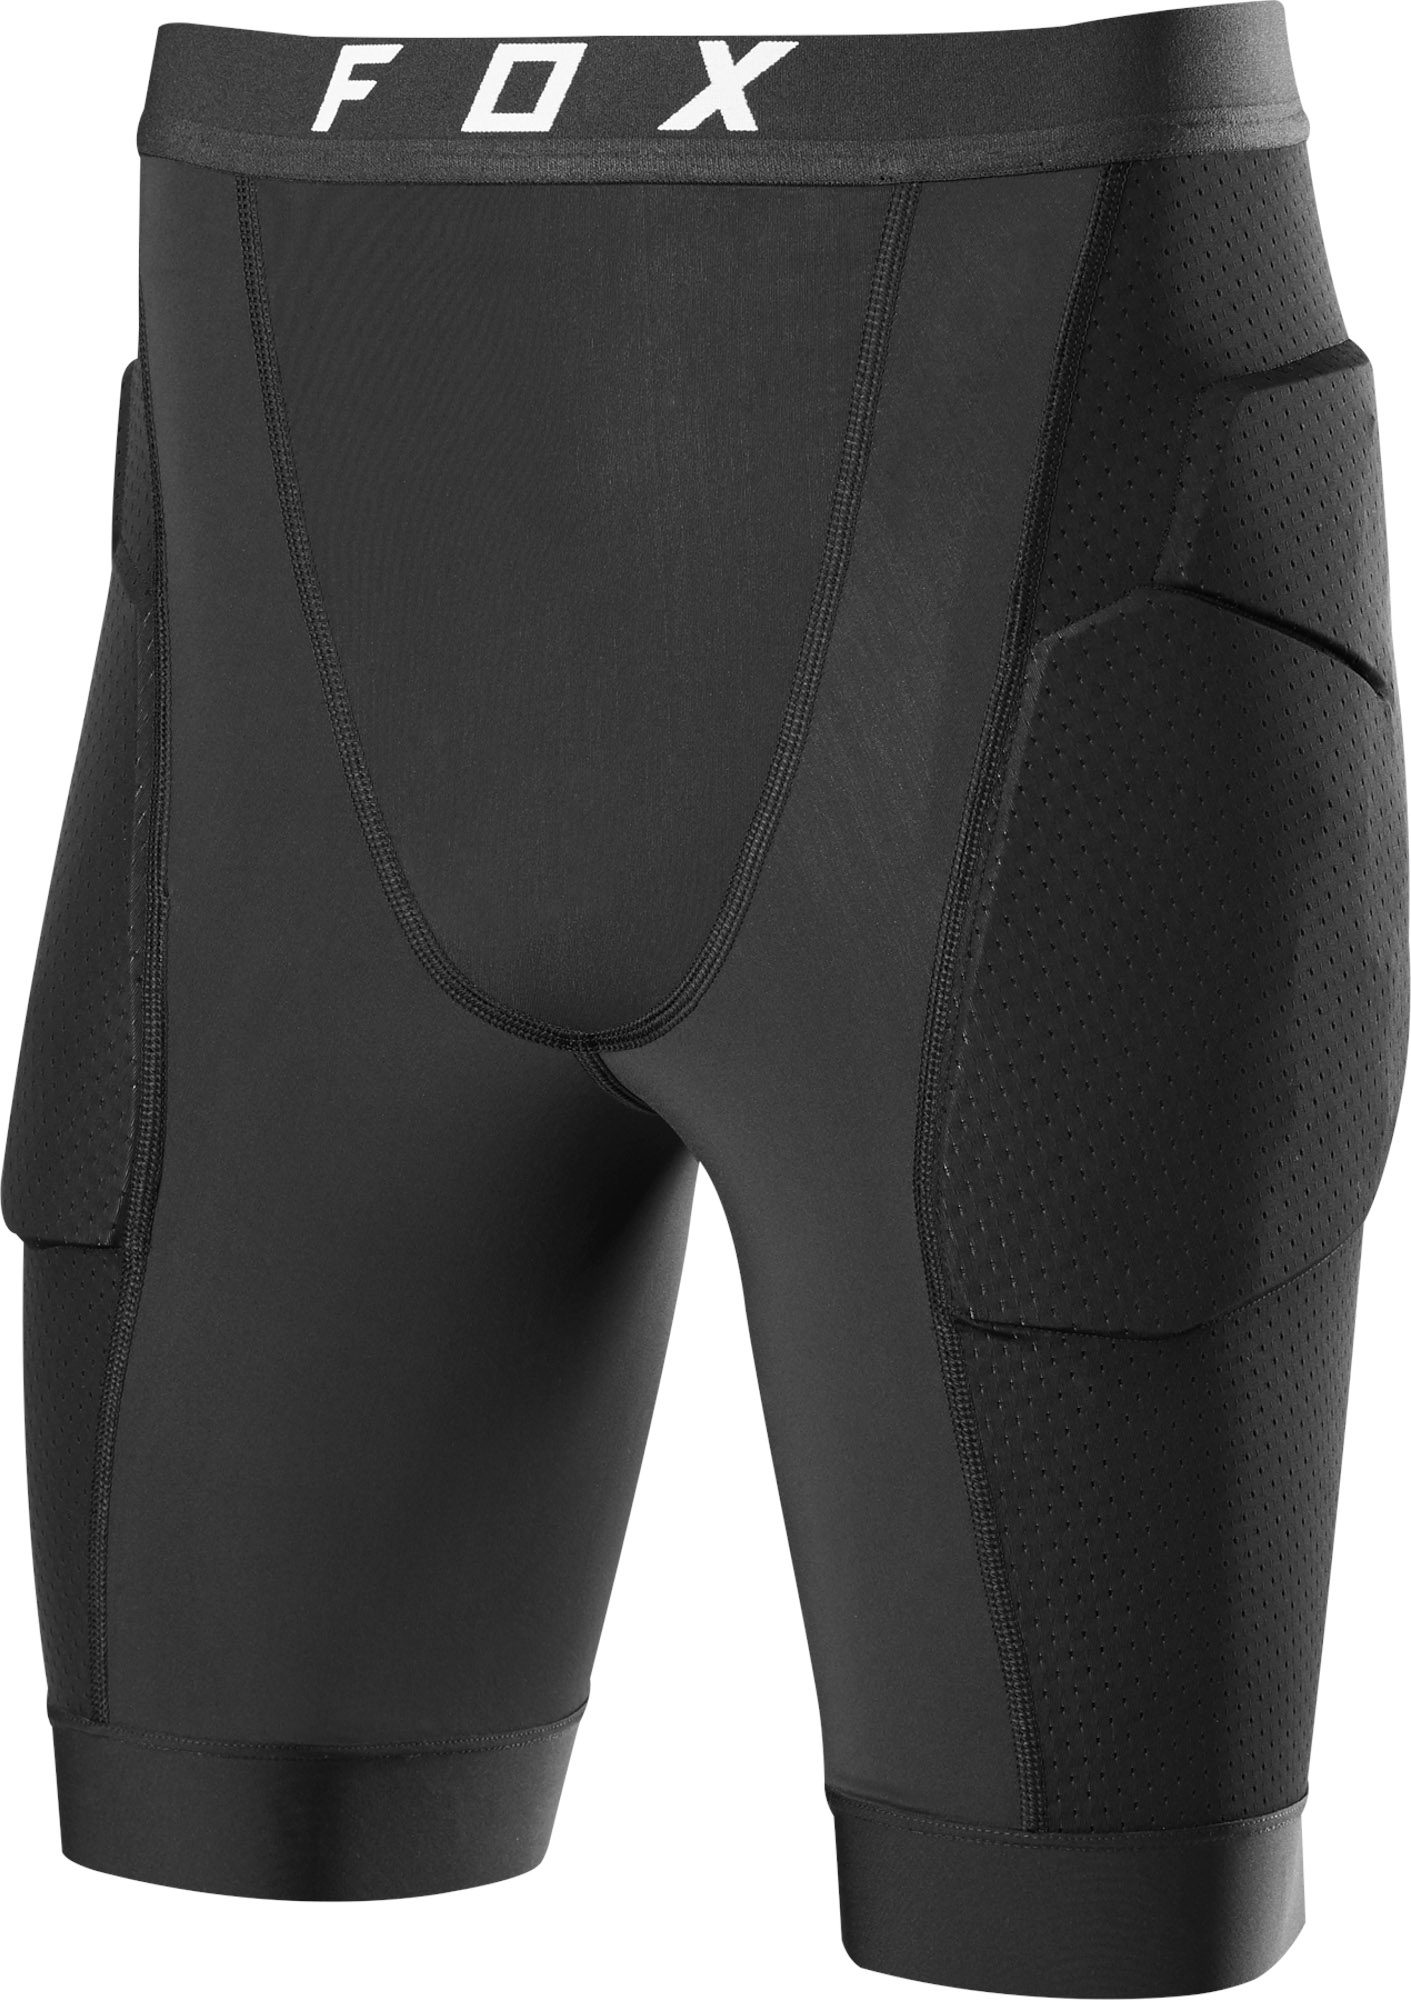 FOX Baseframe Pro Short - L, Black MX22